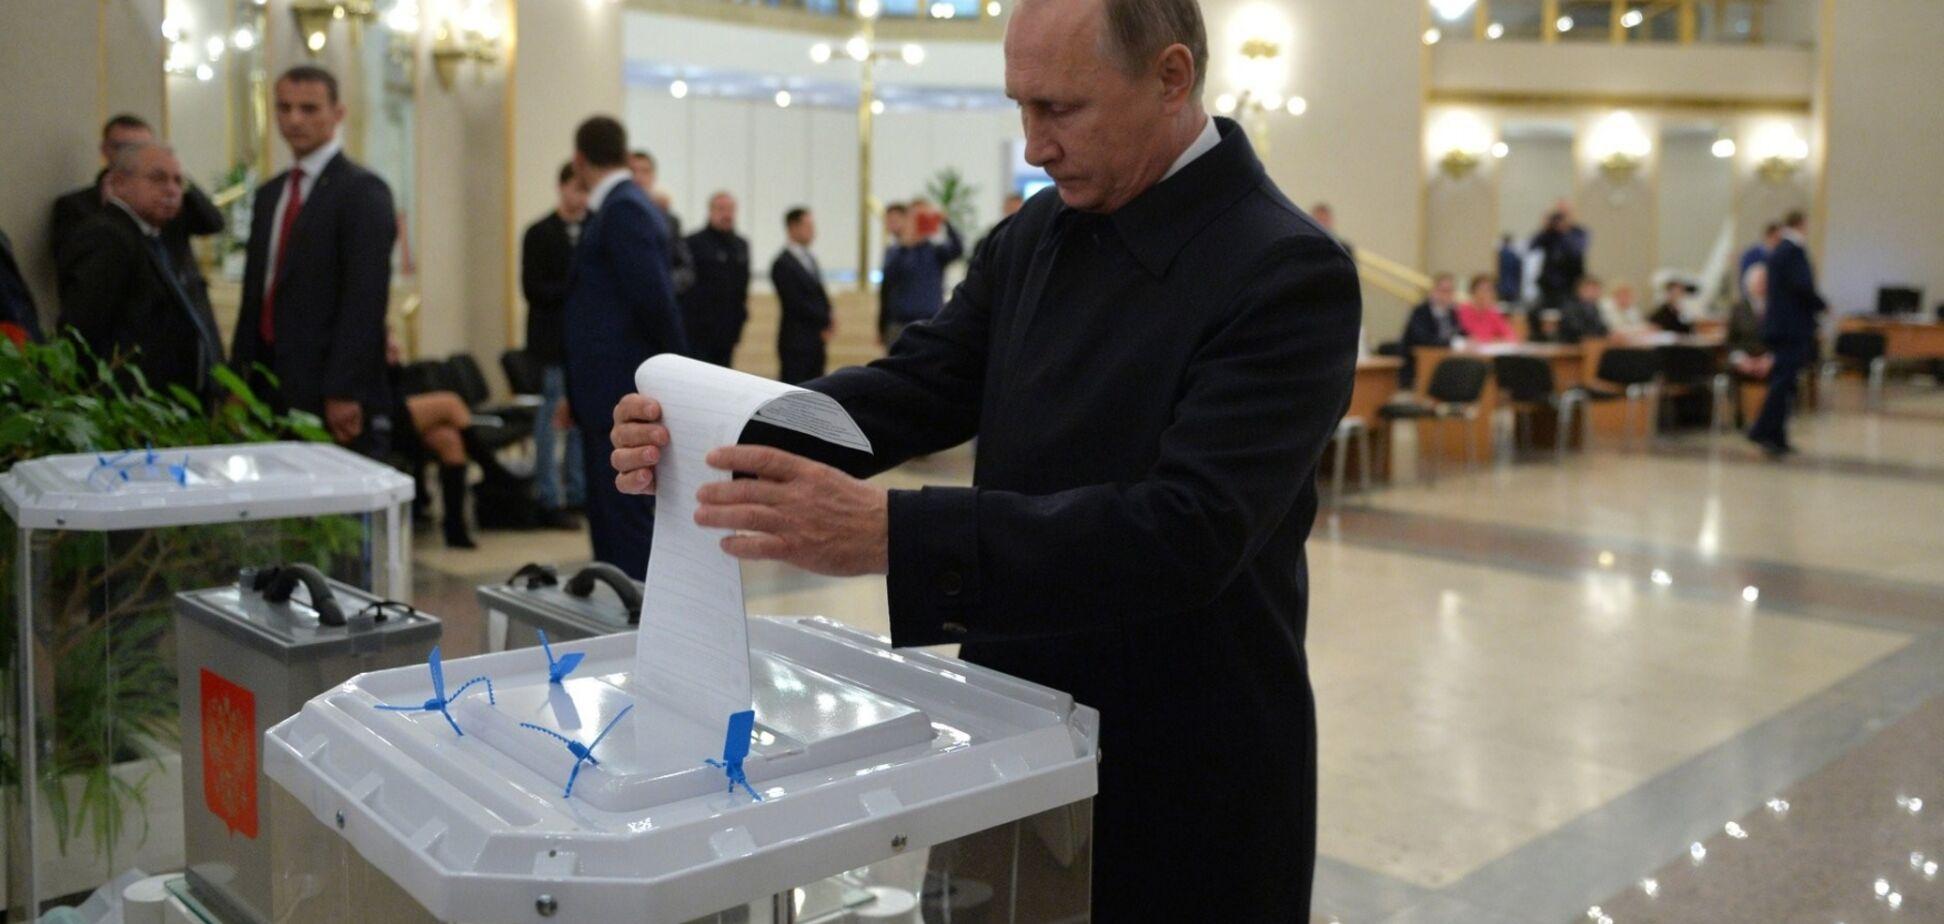 'Русский народ устал': названа главная проблема Путина на выборах